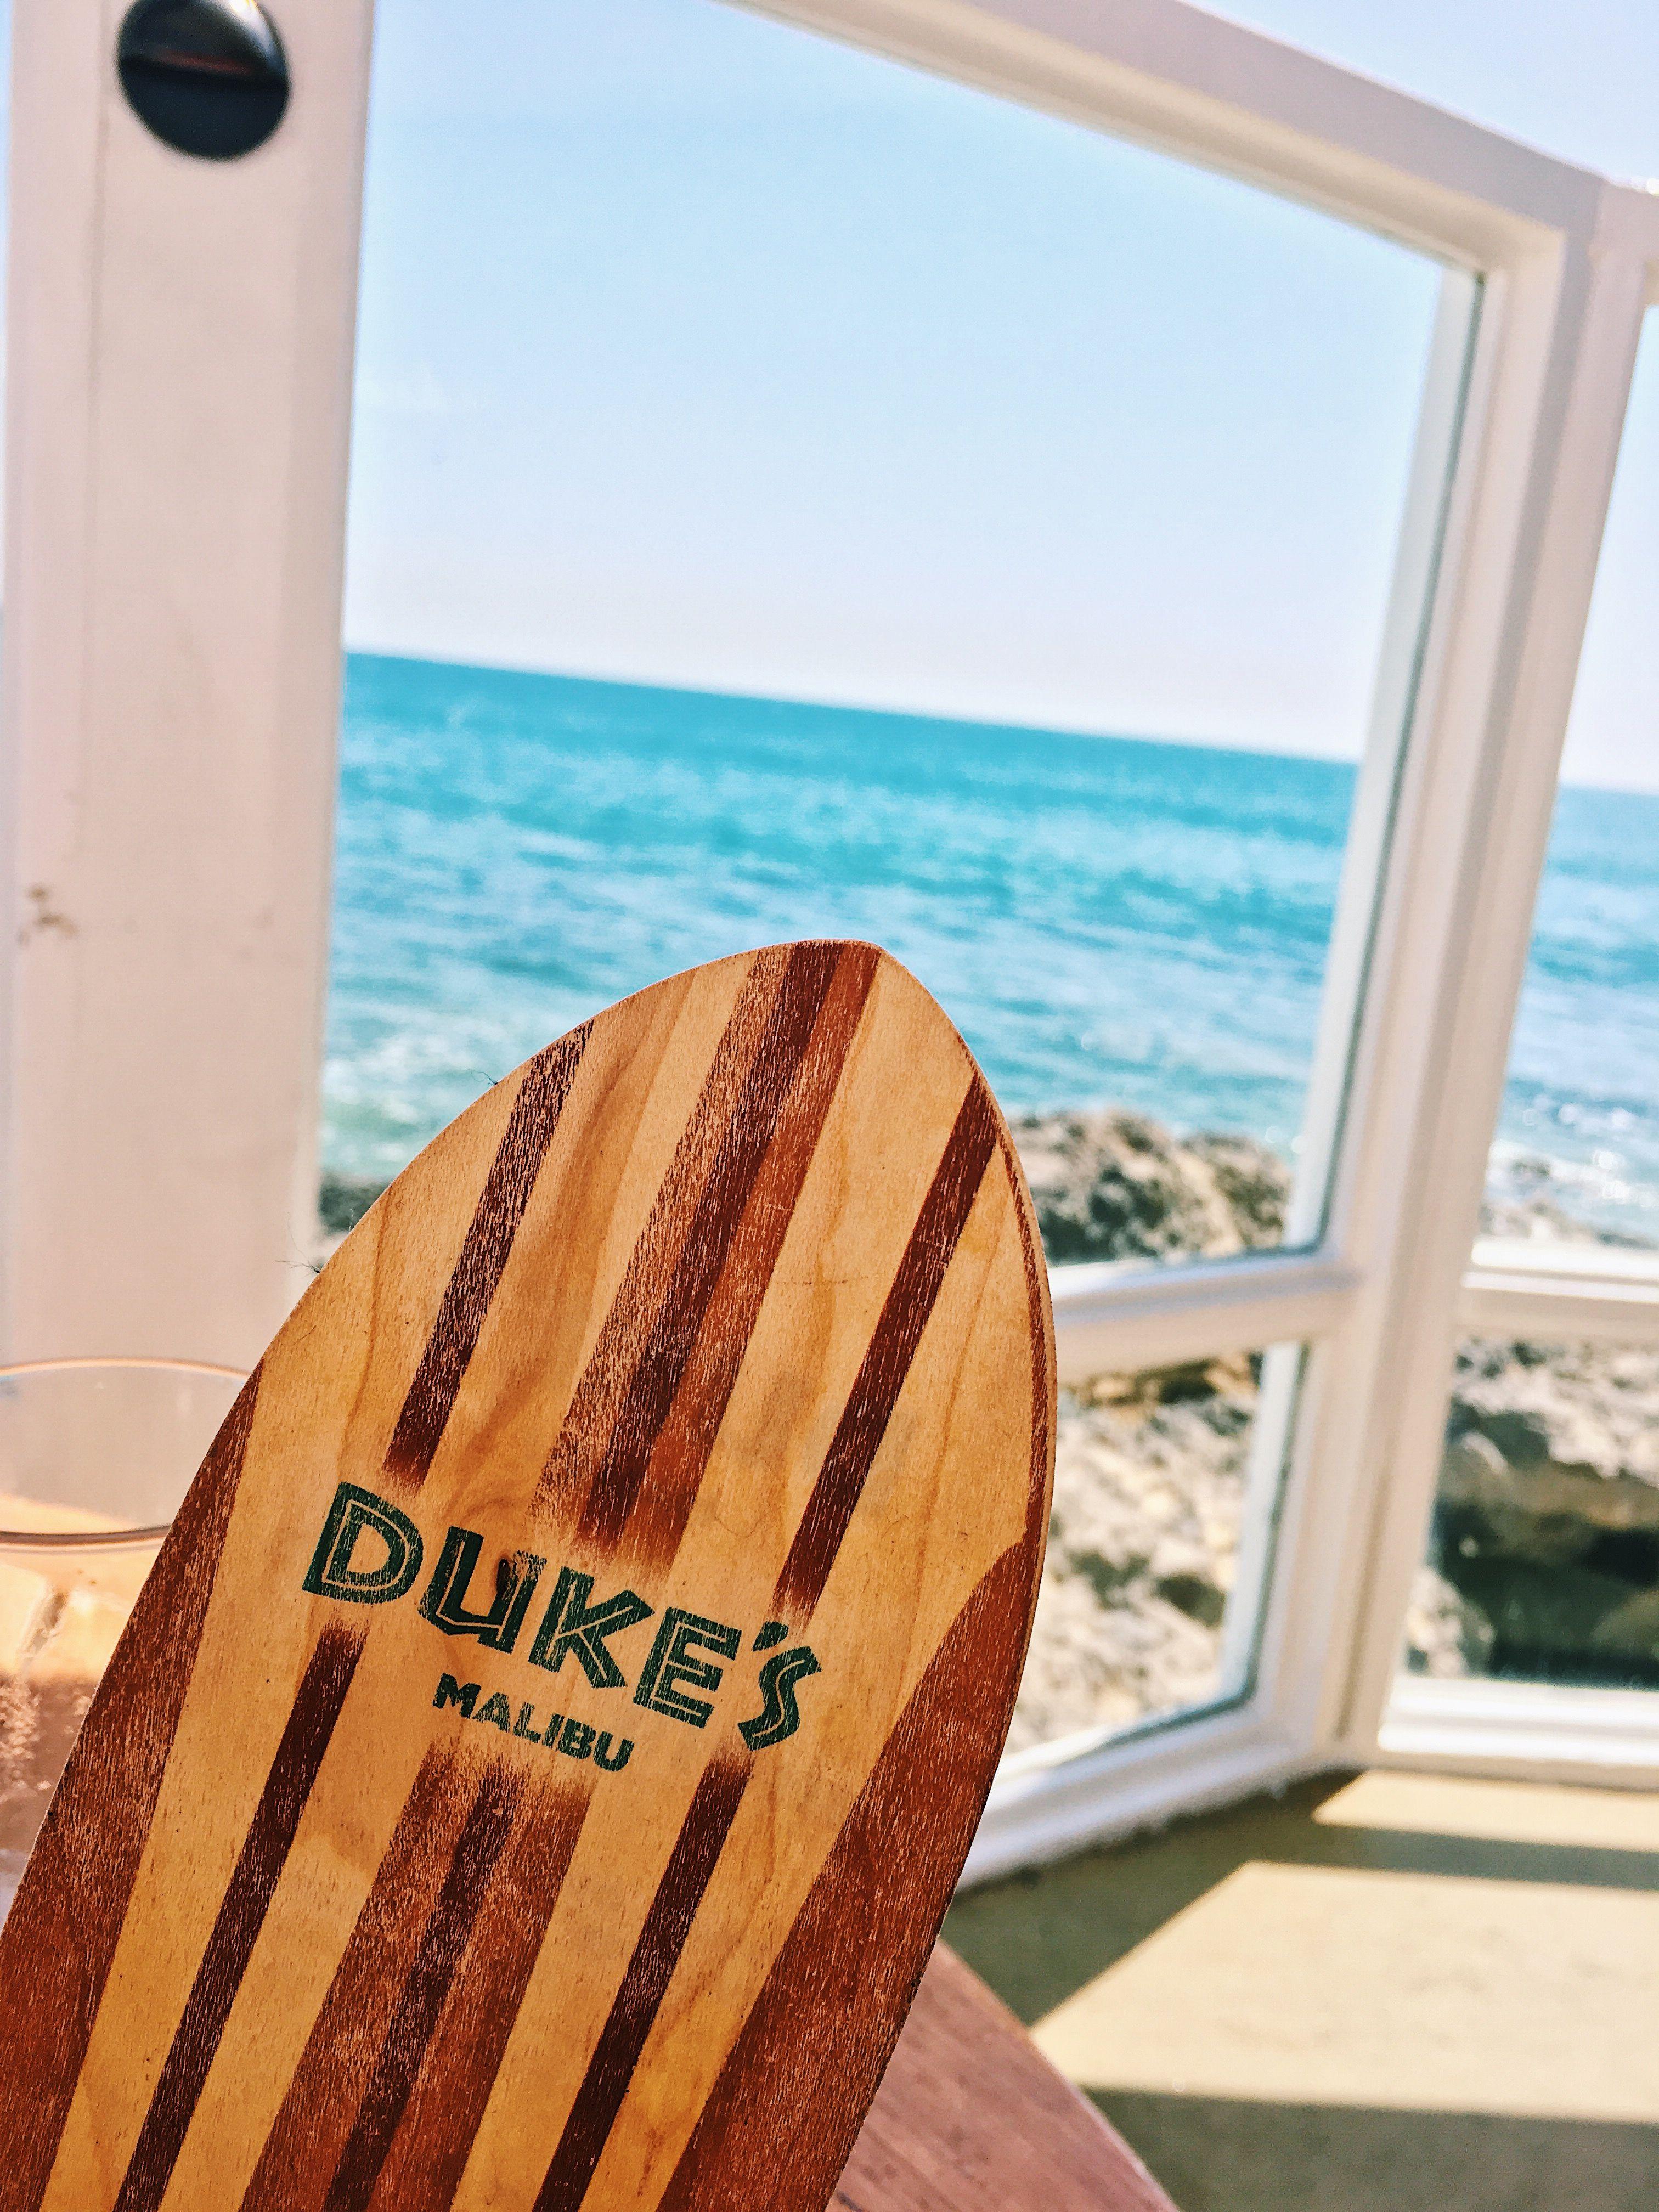 #malibu #duke #dukes #losangeles #zuma #dolphins #surfer #surf #surfing #menu